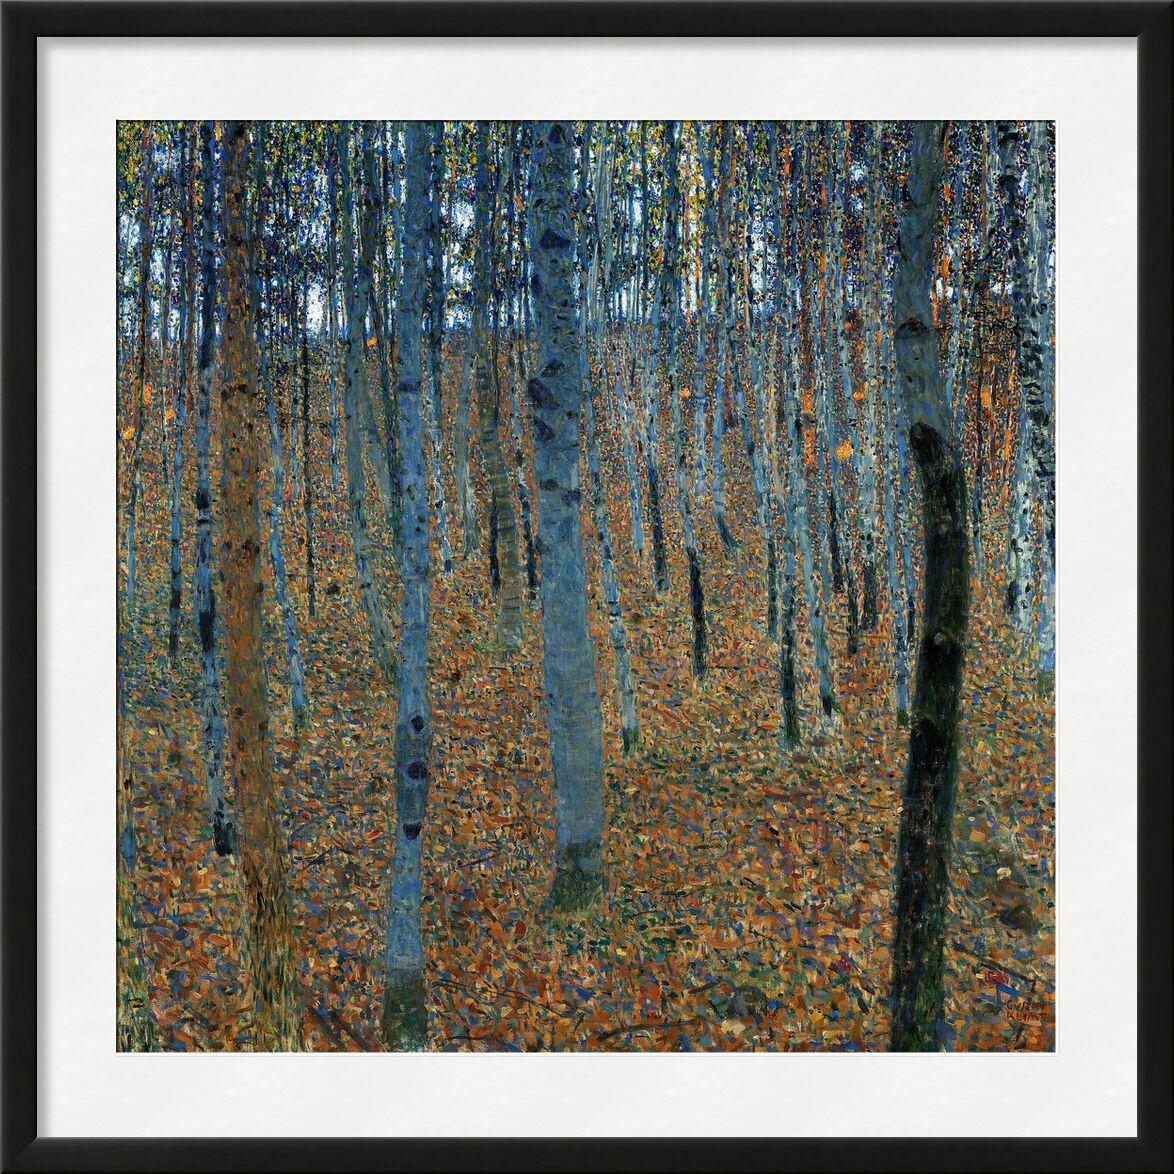 Beech Forest - Gustav Klimt from AUX BEAUX-ARTS, Prodi Art, forest, autumn, leaves, trees, KLIMT, Art Nouveau, birch